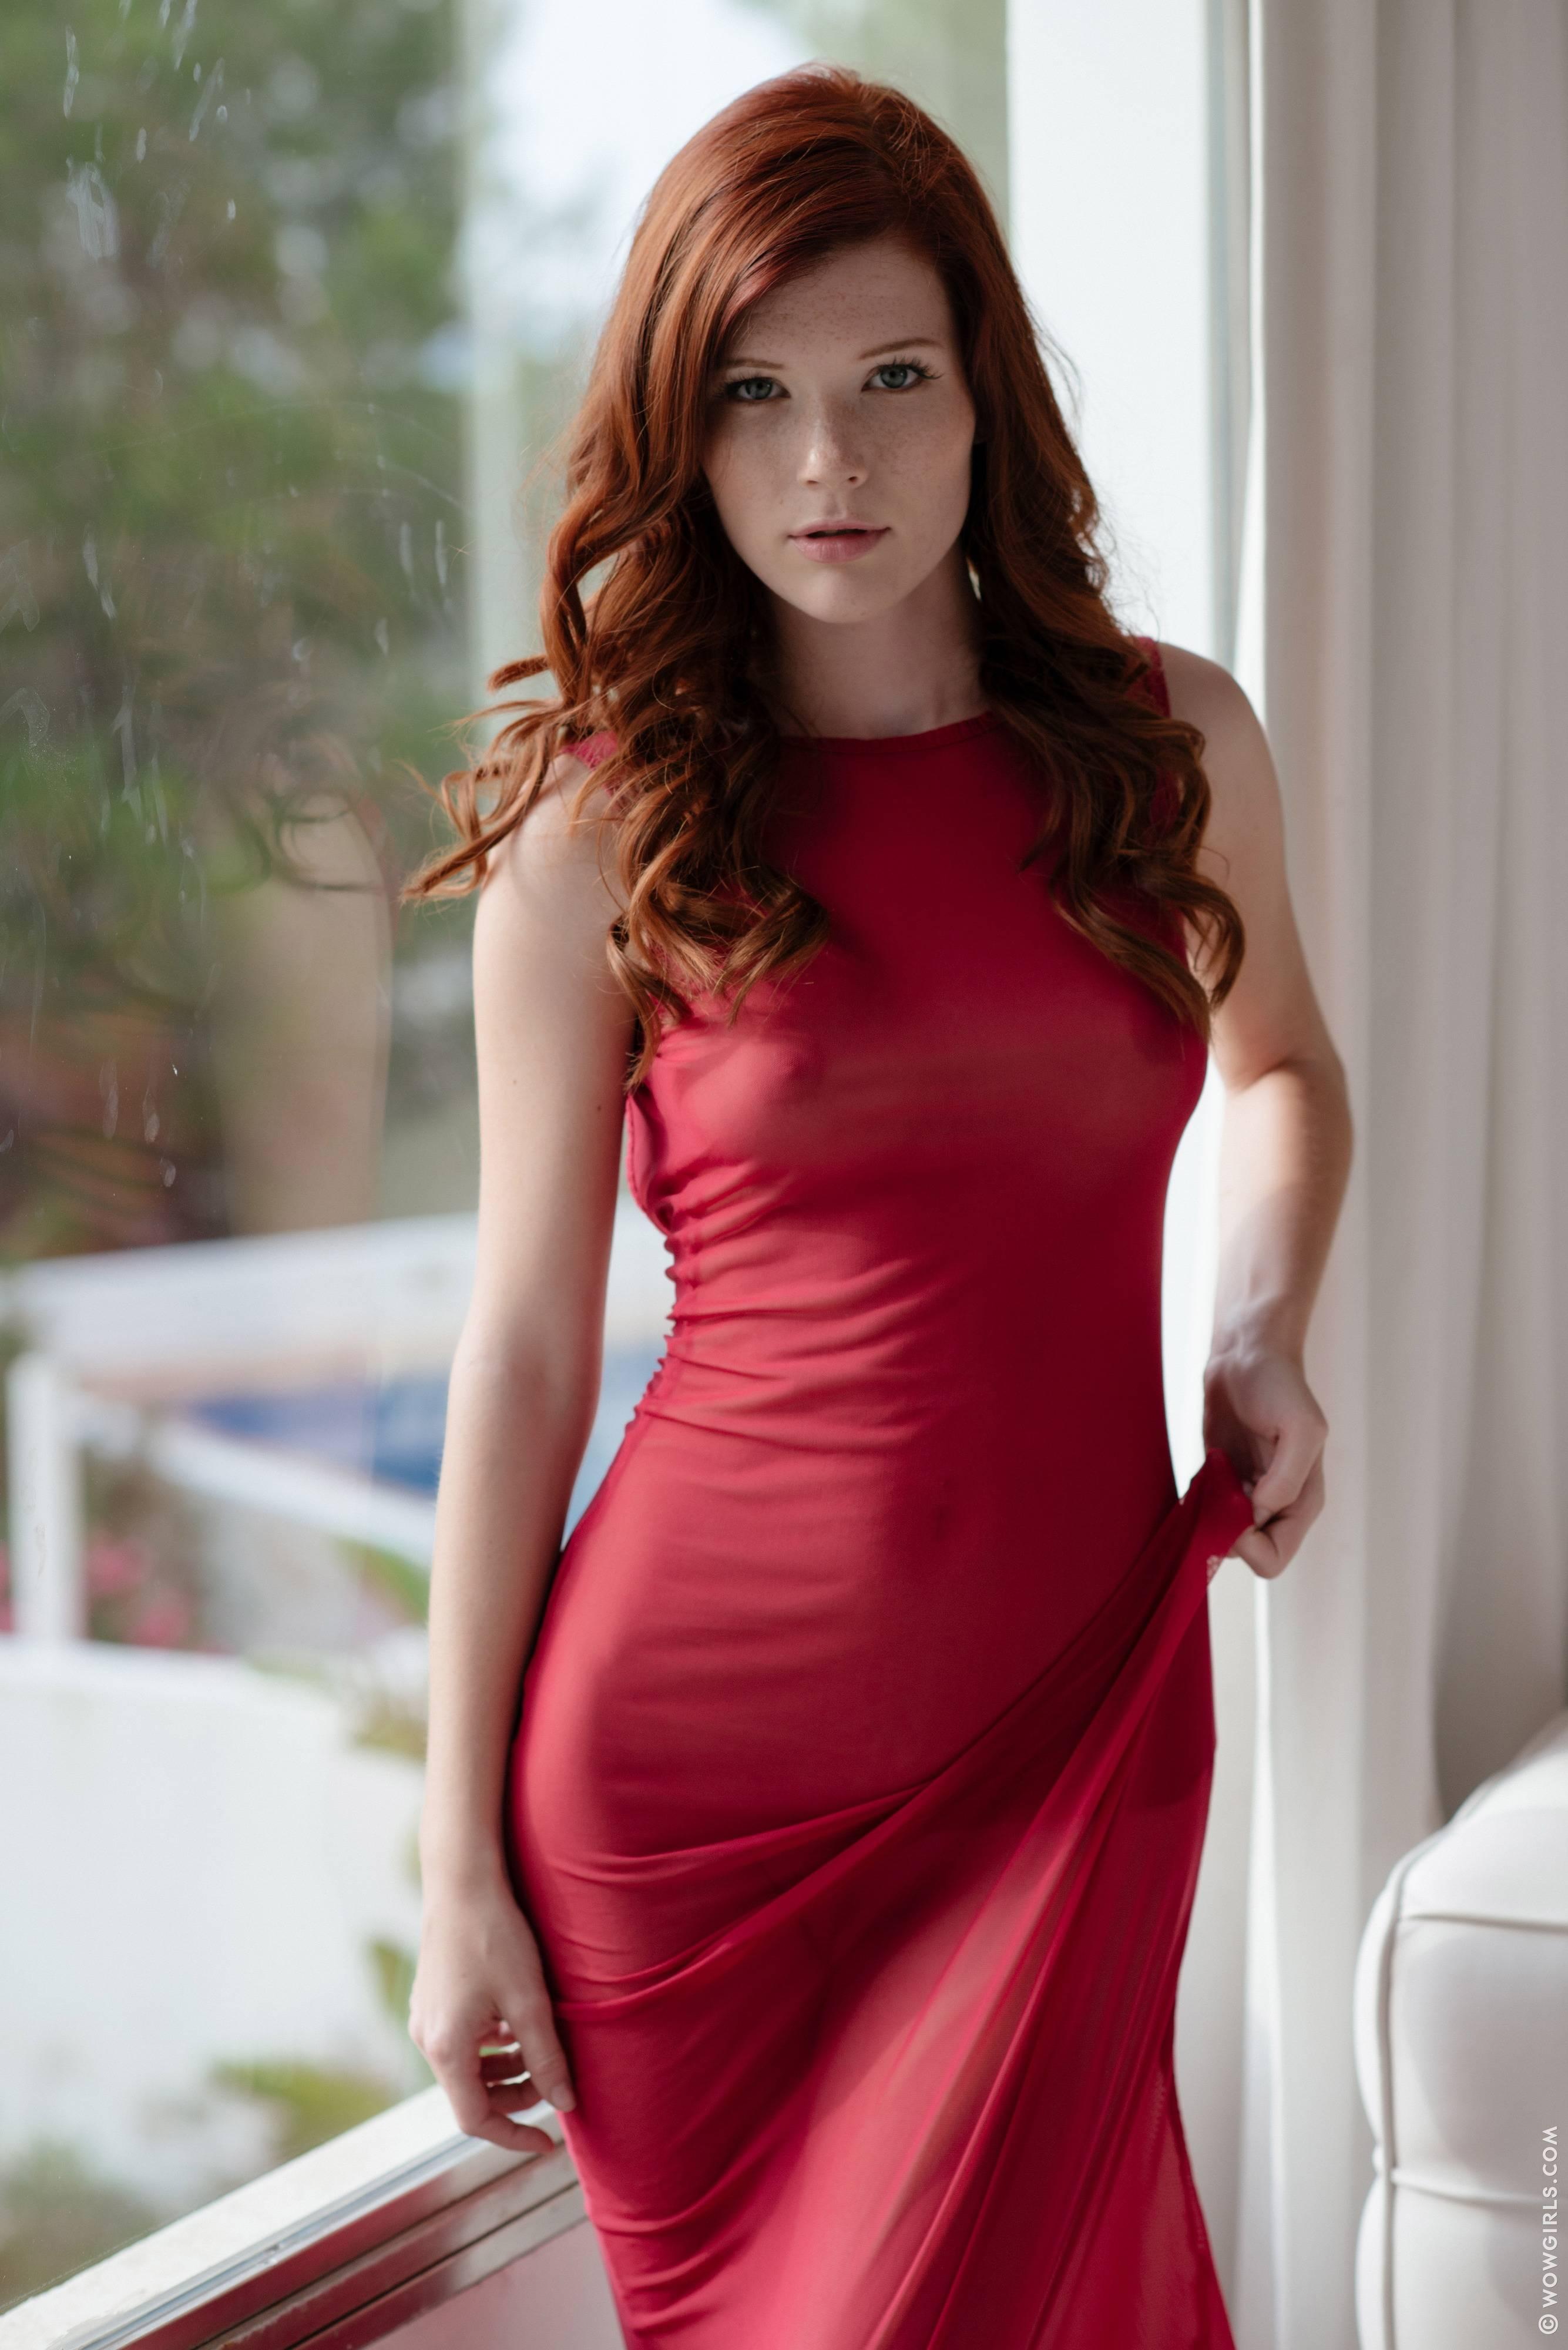 Free hot pic redhead #5